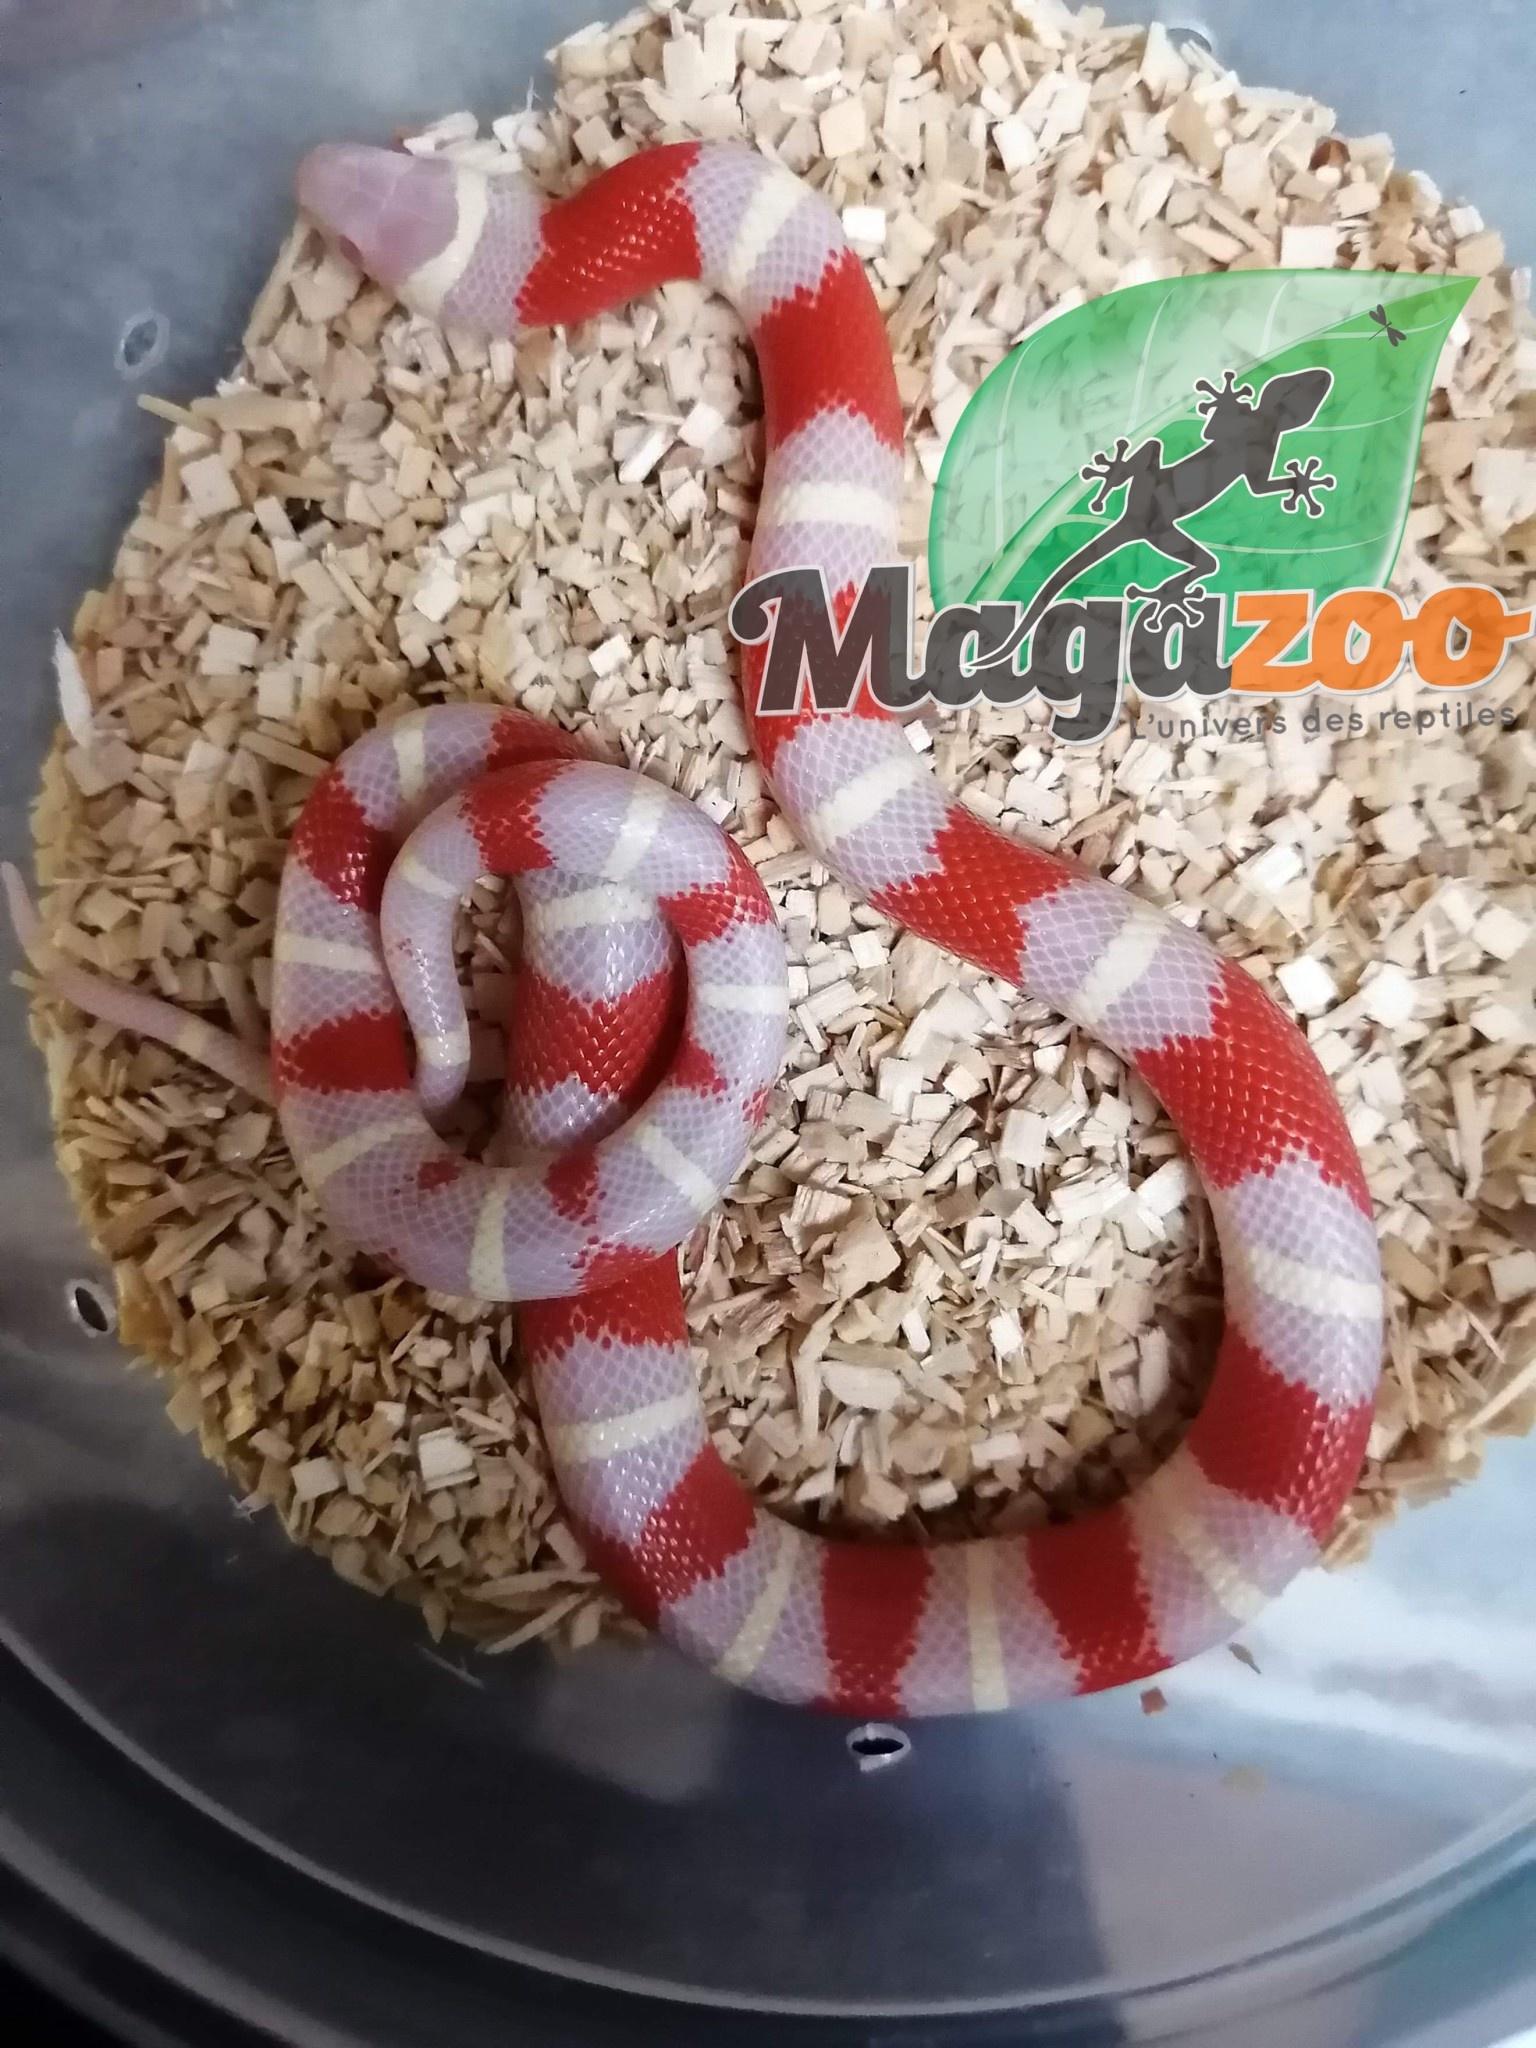 Magazoo Serpent Laitier Nelson Albino Bébé femelle